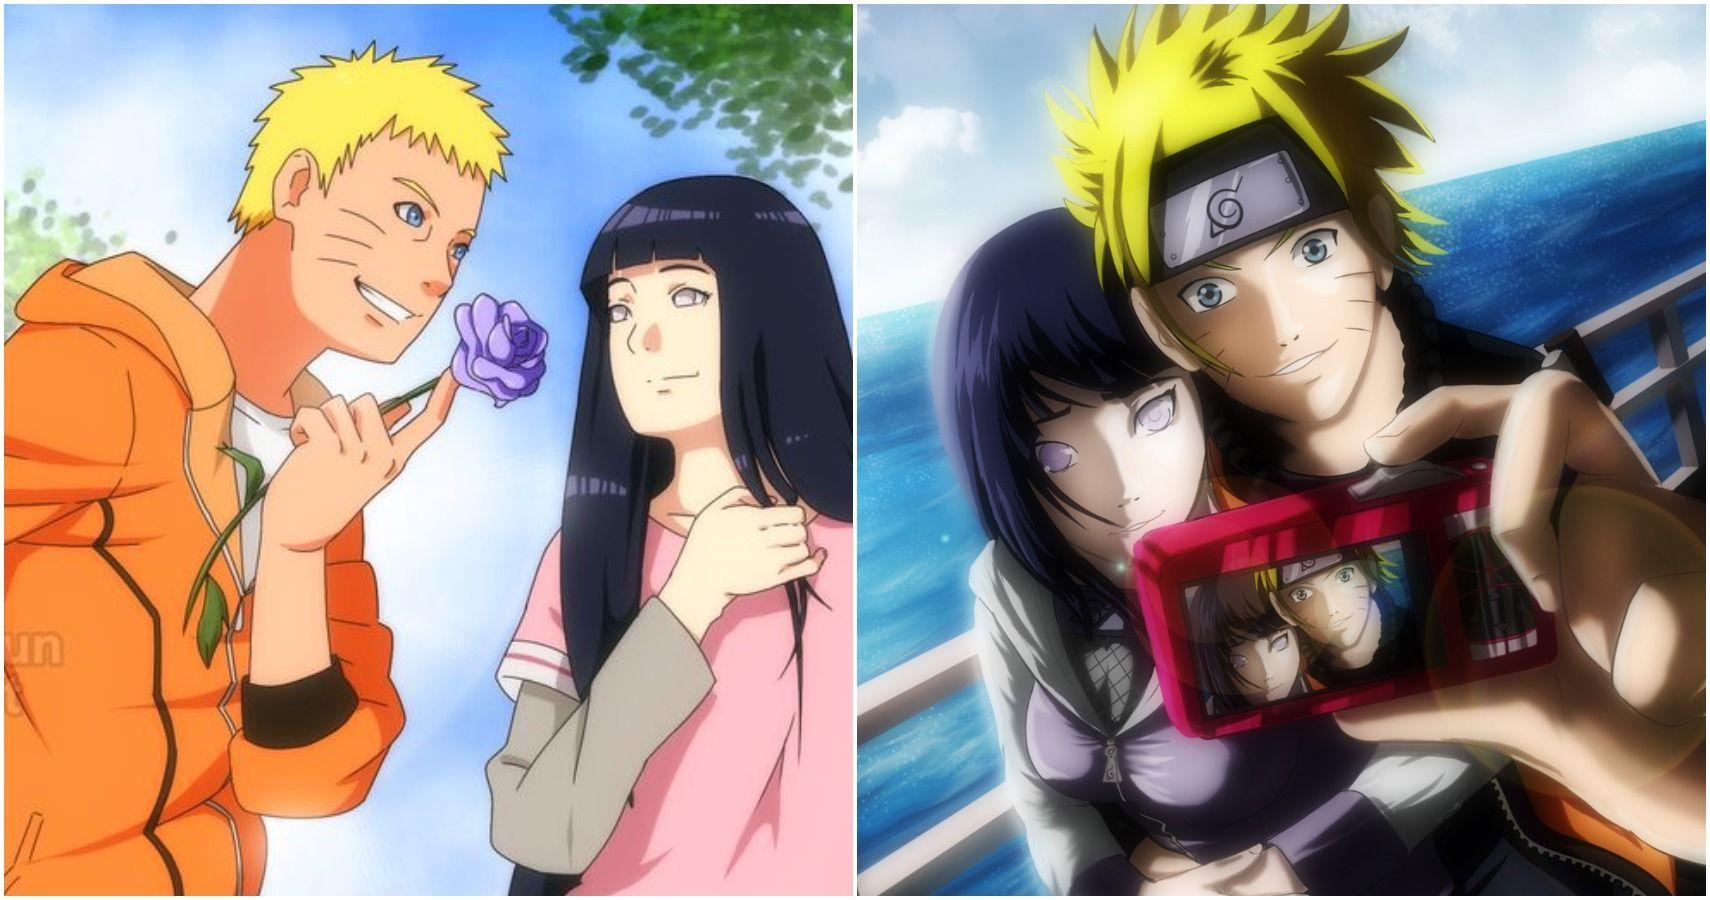 Naruto 10 Pieces Of Naruto Hinata Fan Art That Are Totally Romantic